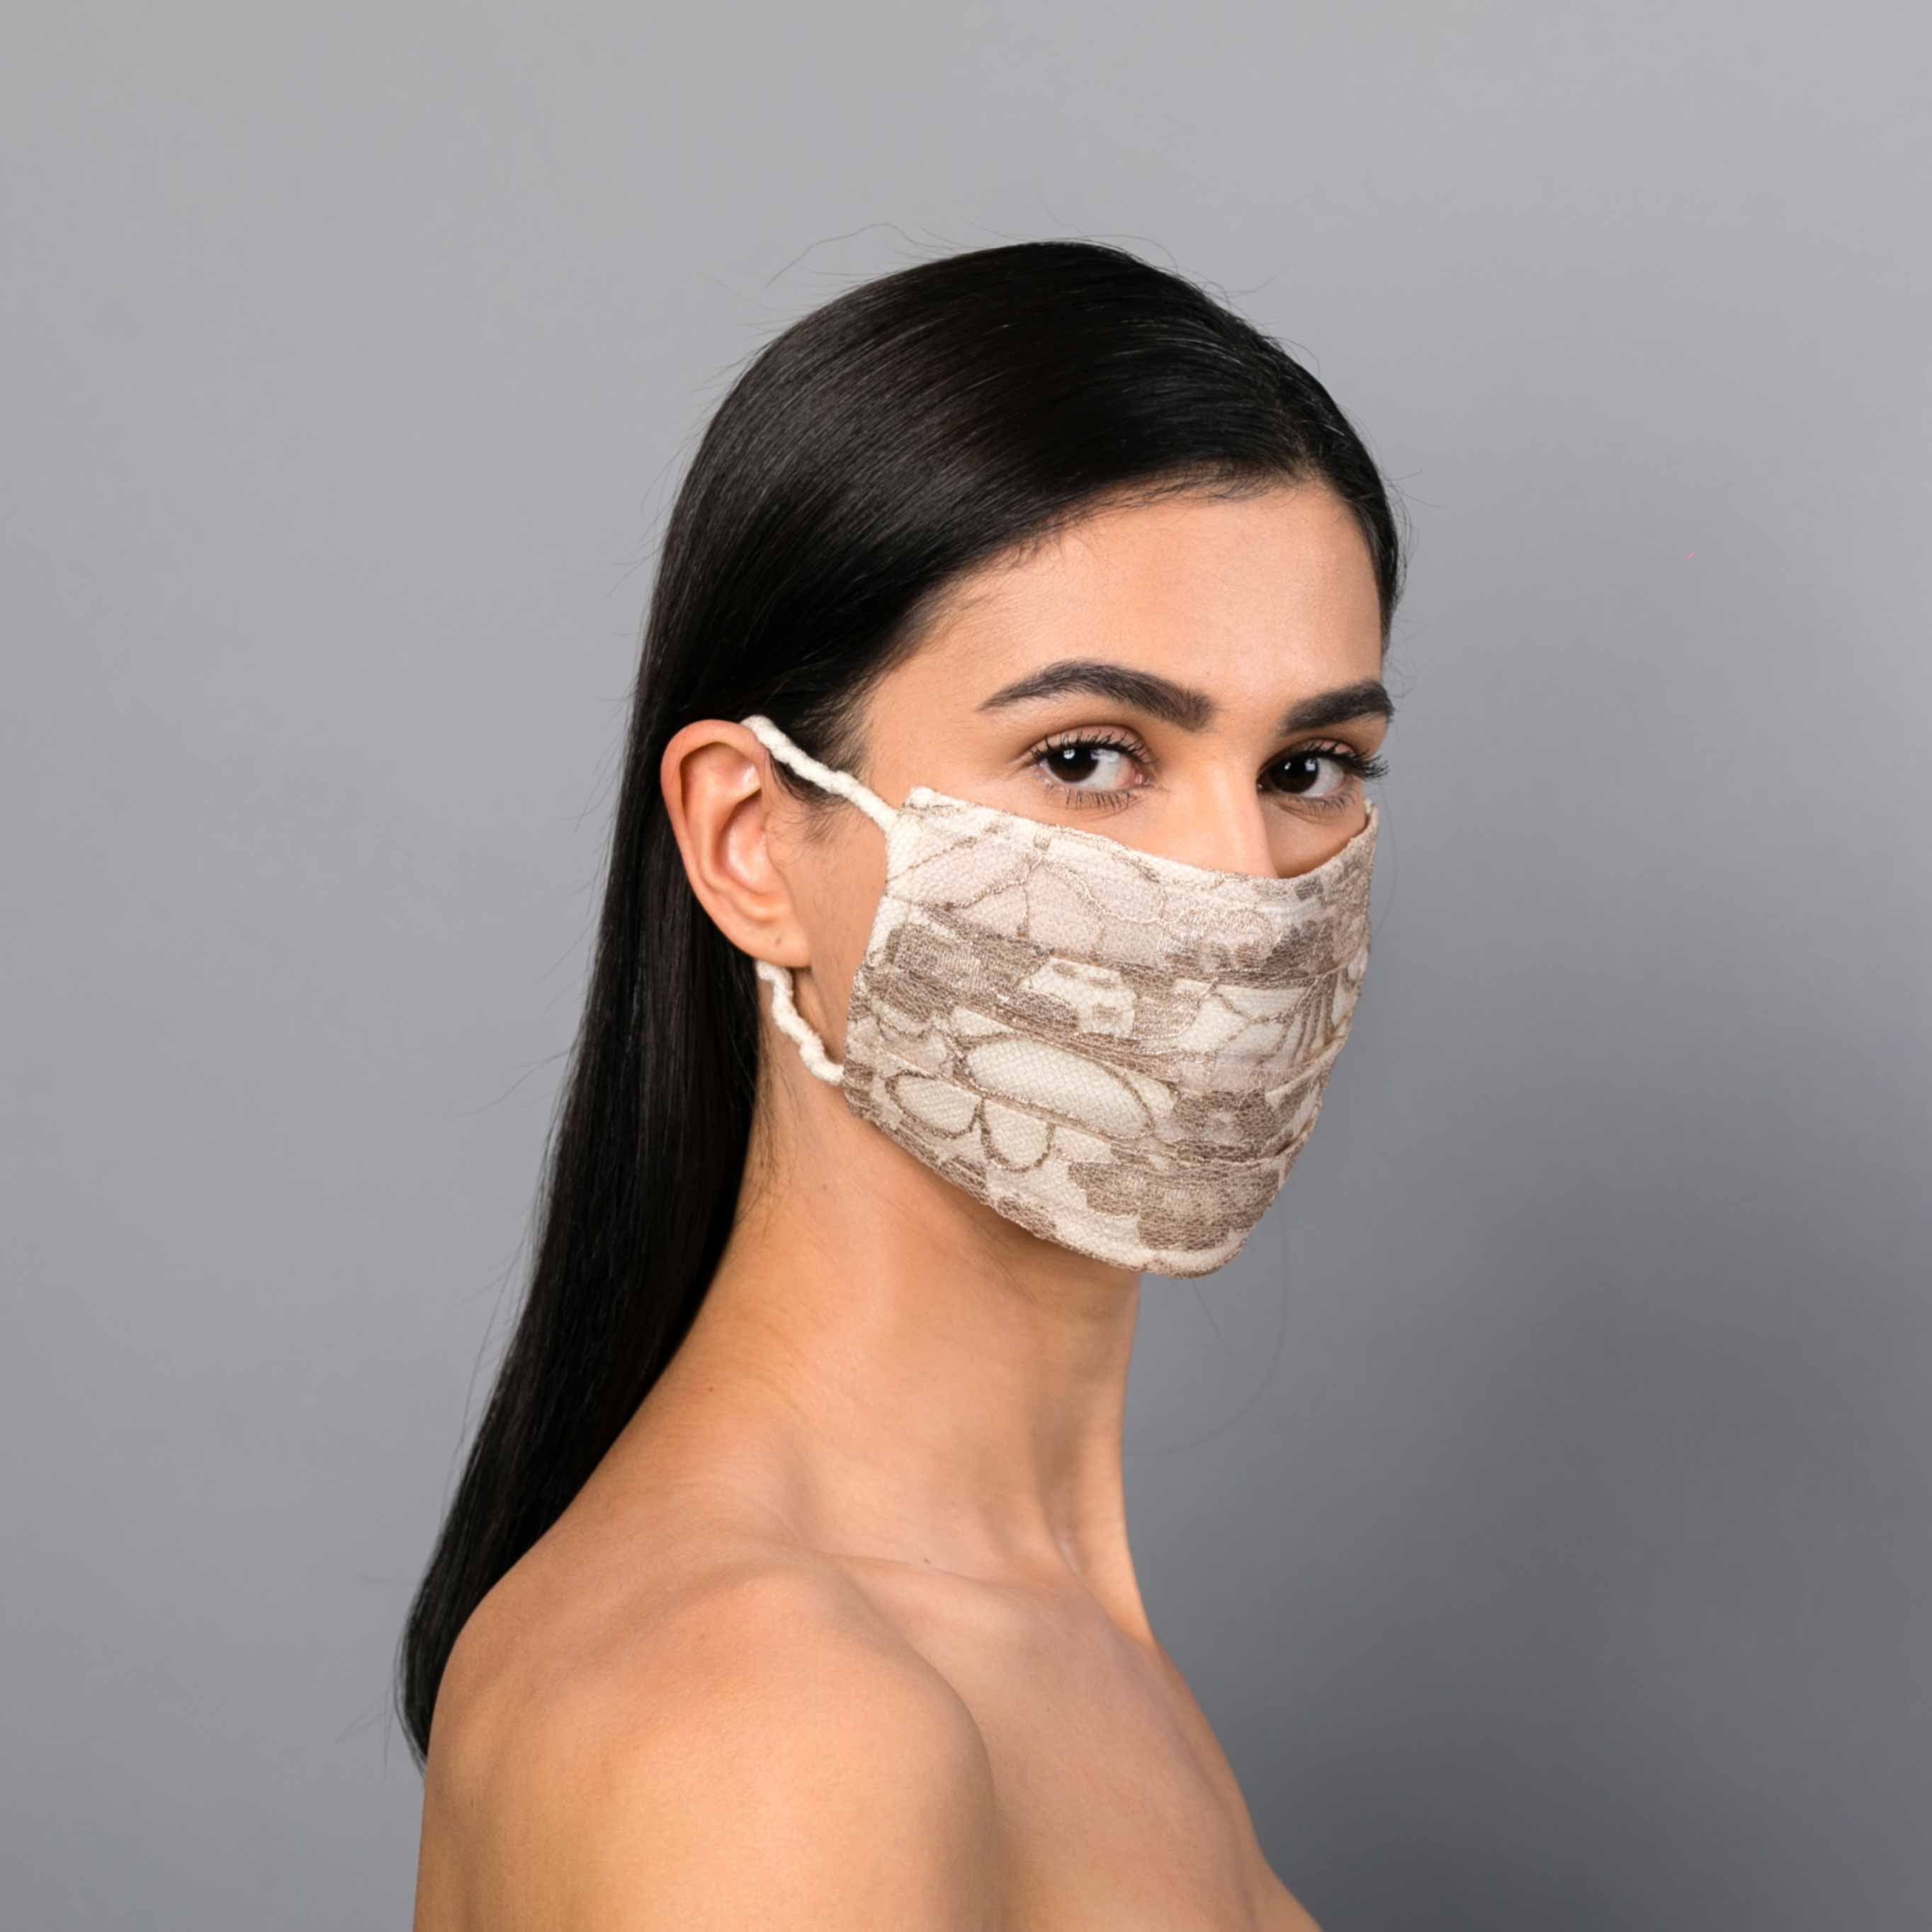 Beige lace mask